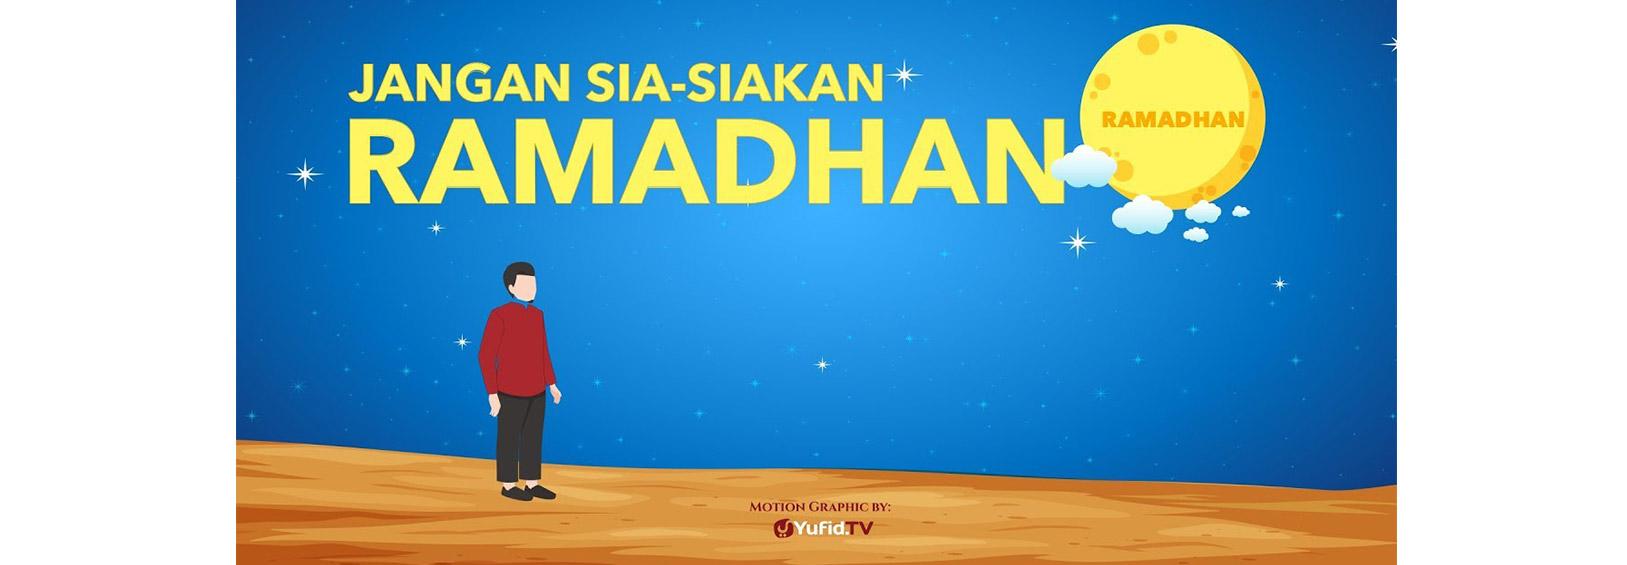 Jangan Sia-Siakan Ramadhan